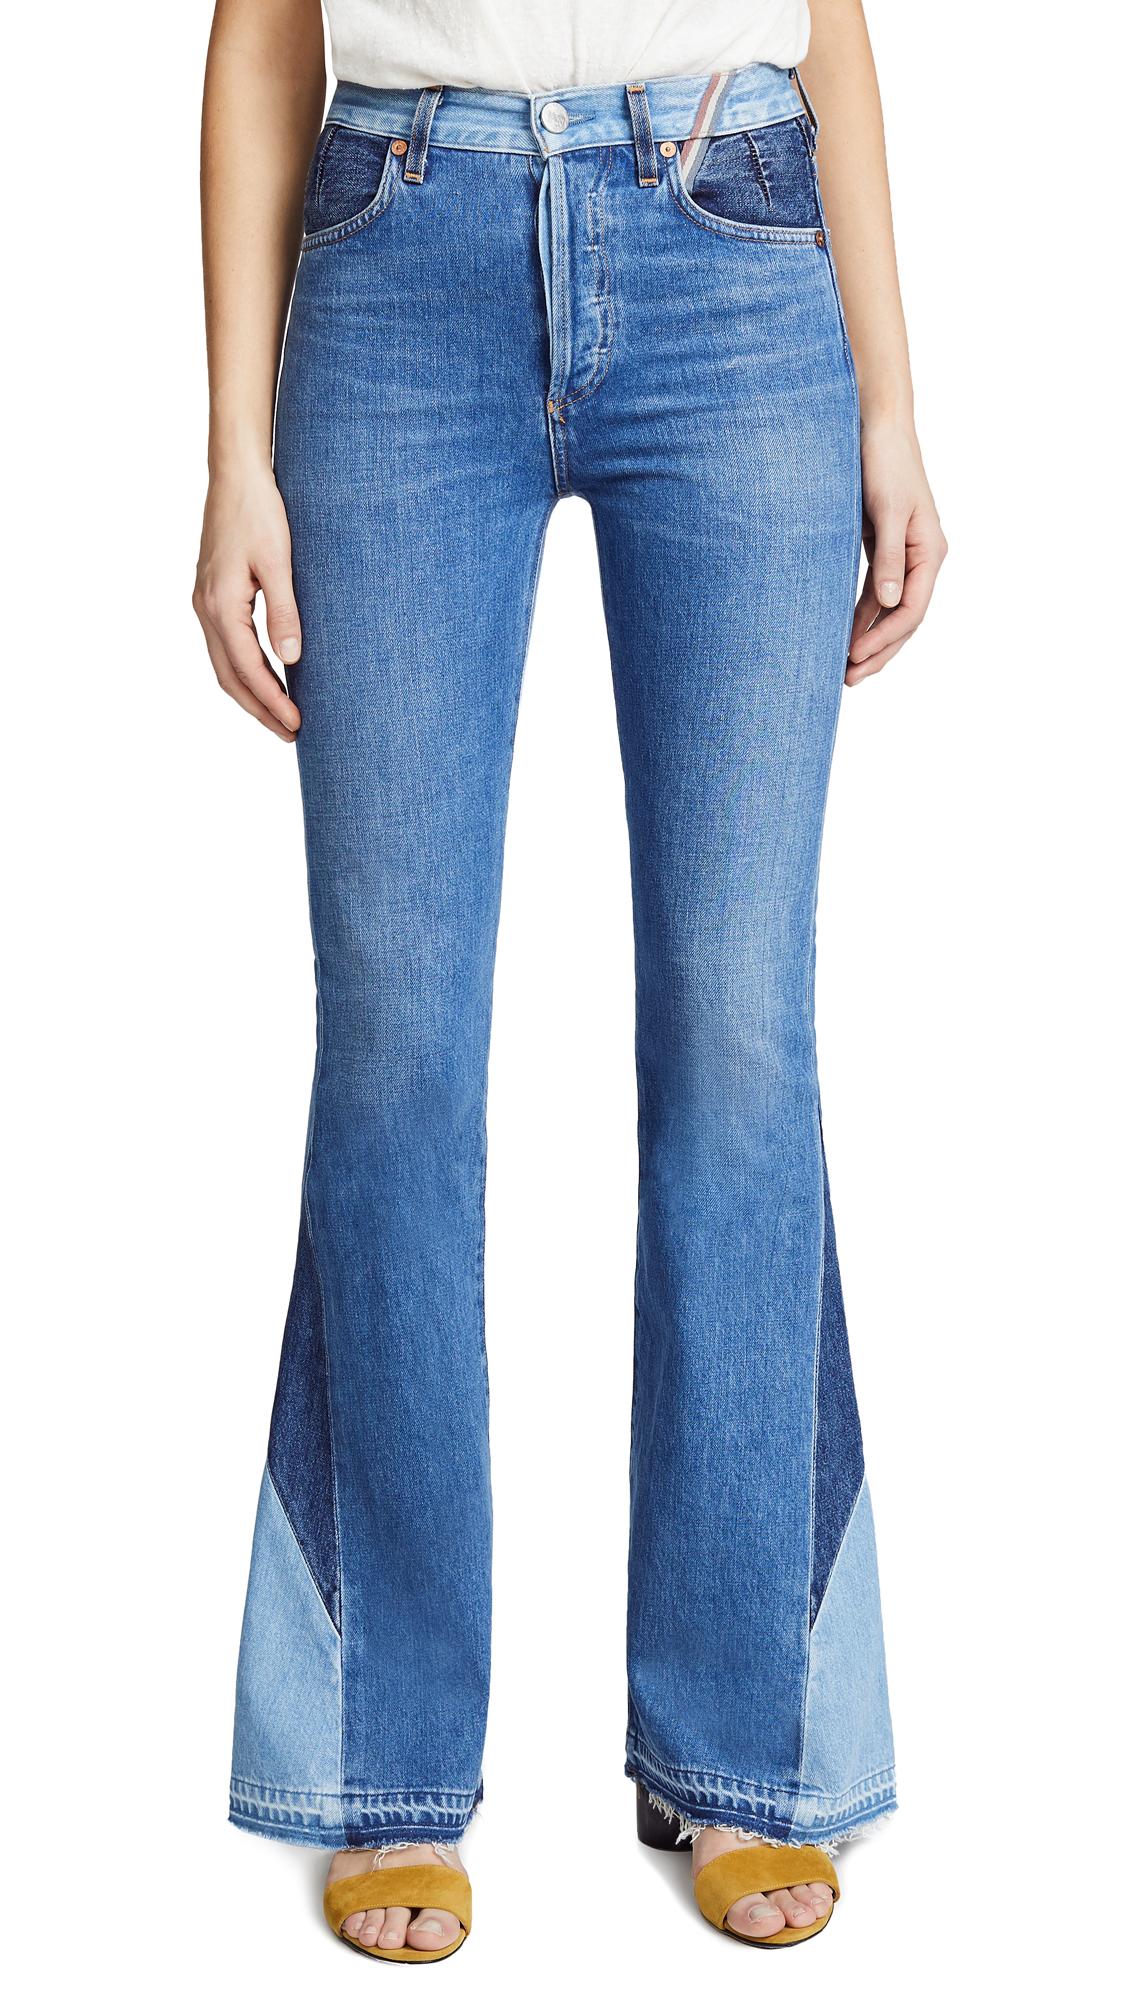 Jean Atelier Janis Flare Jeans In Jagger